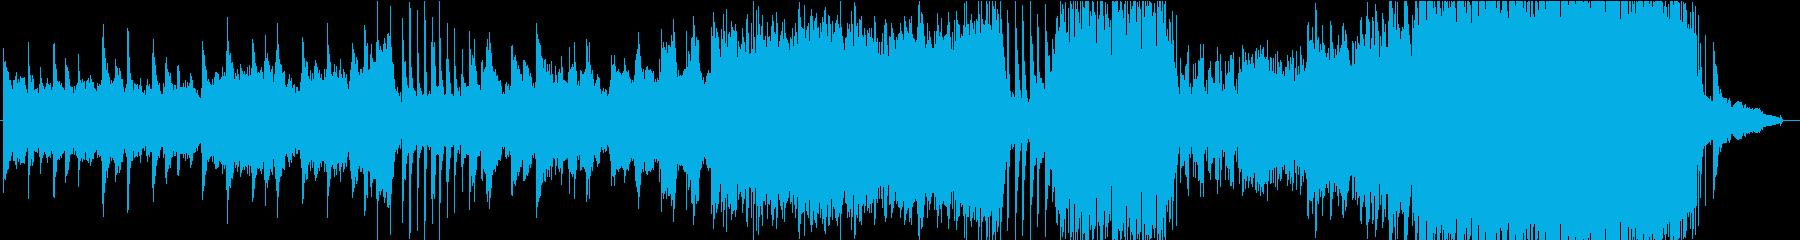 Akegureの再生済みの波形